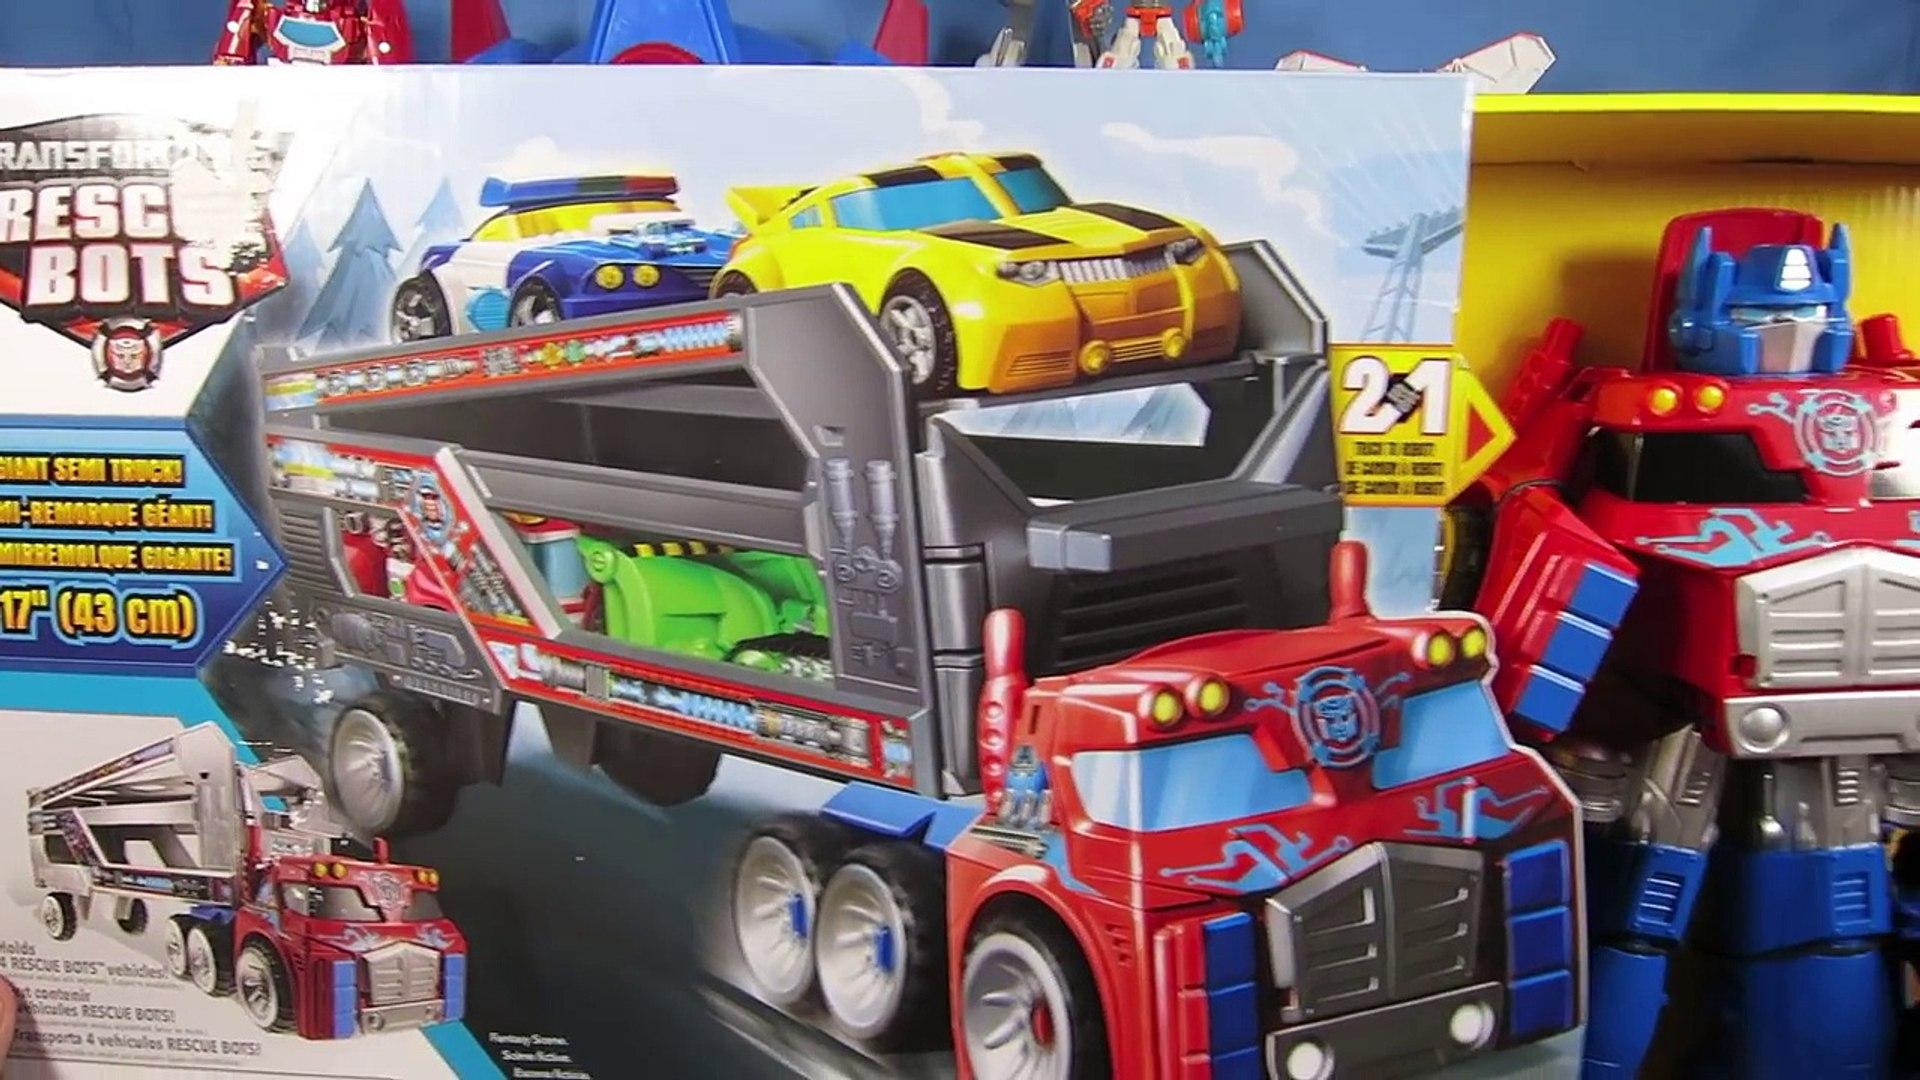 Transformers Optimus Prime Truck Bumblebee Transformation Spielzeug Kinder  Neu Transformers & Roboter